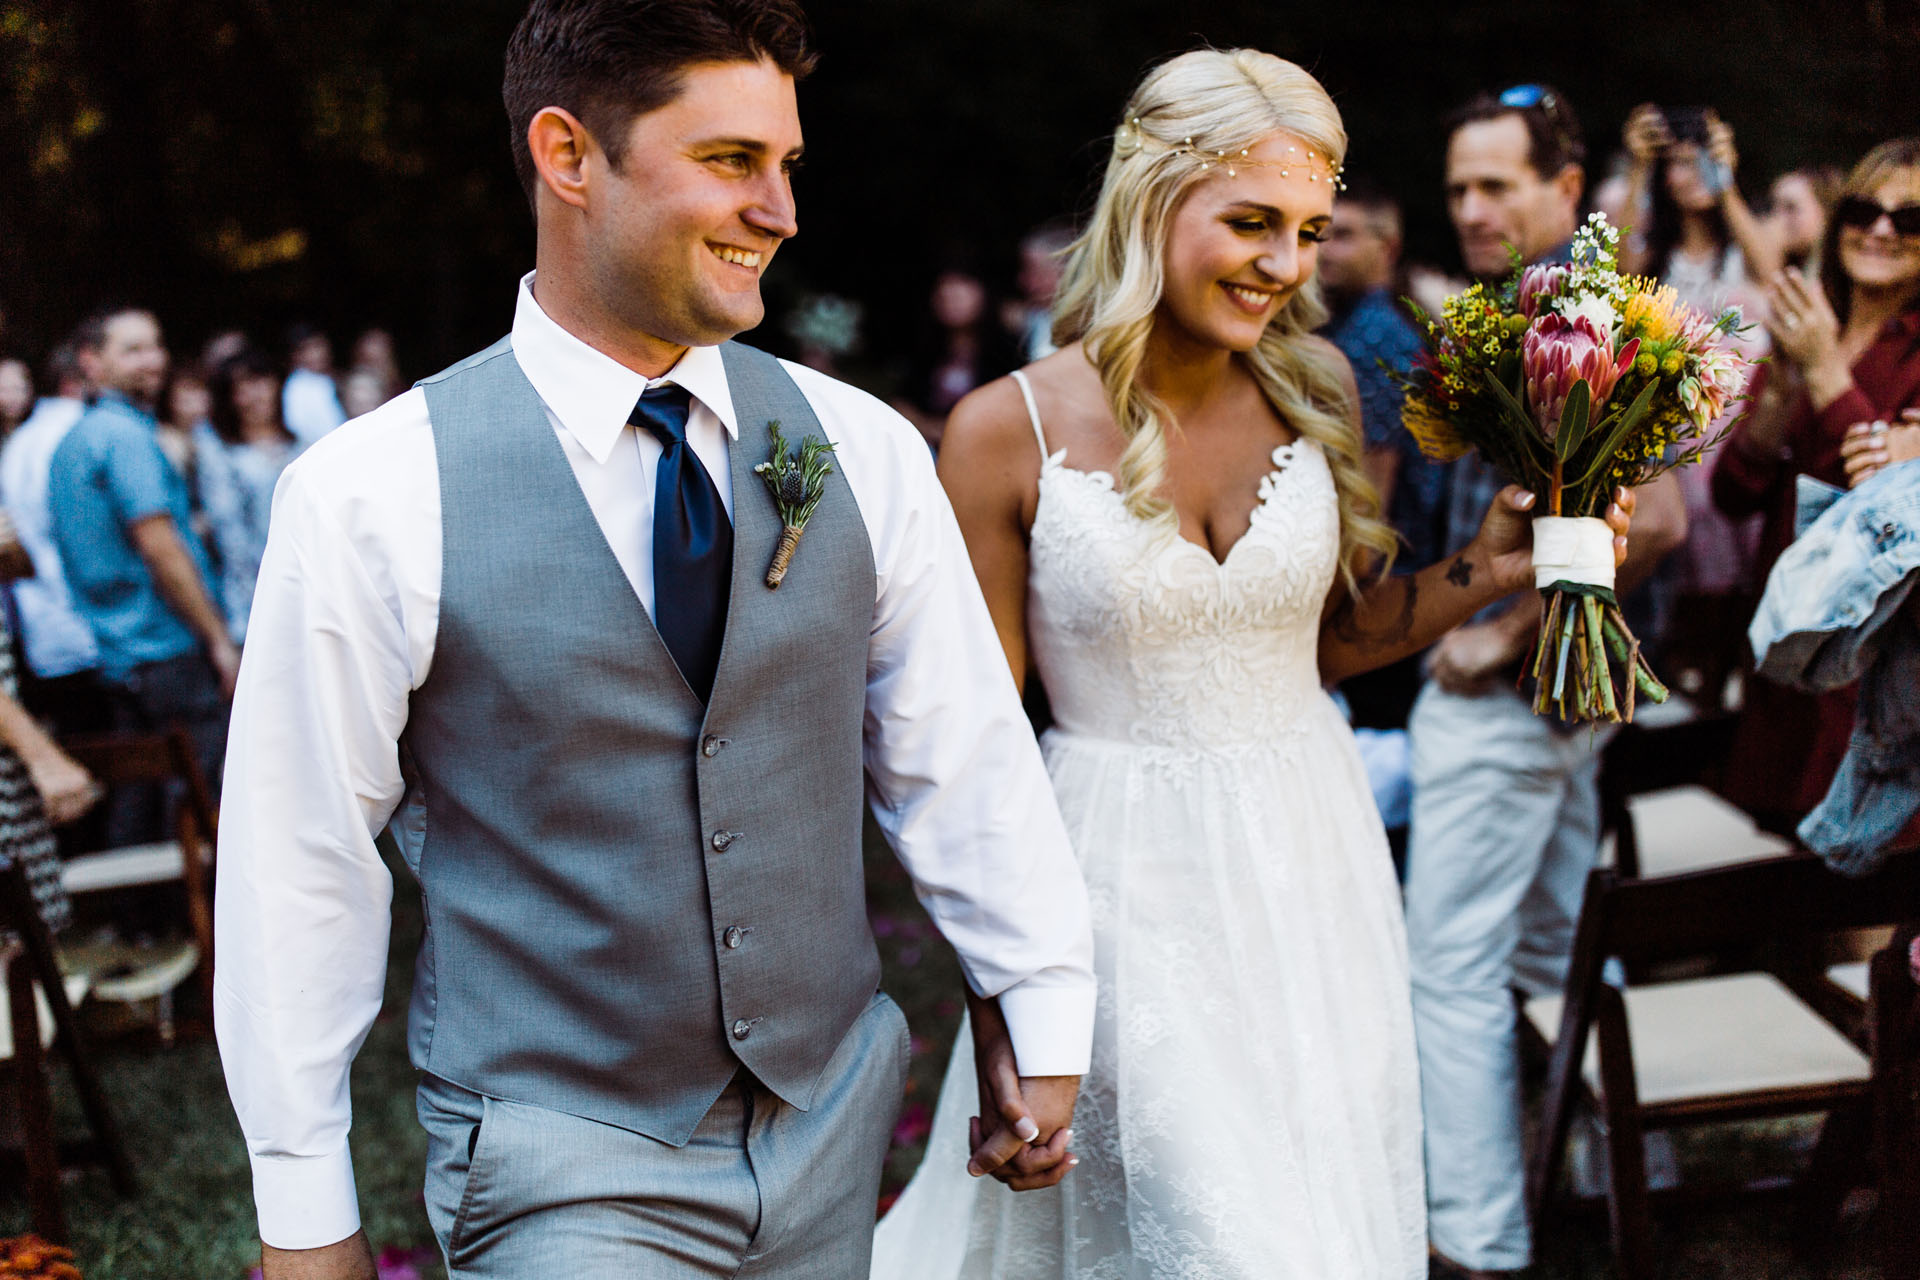 10-7-17 Devon and Jordan's Wedding-117.jpg